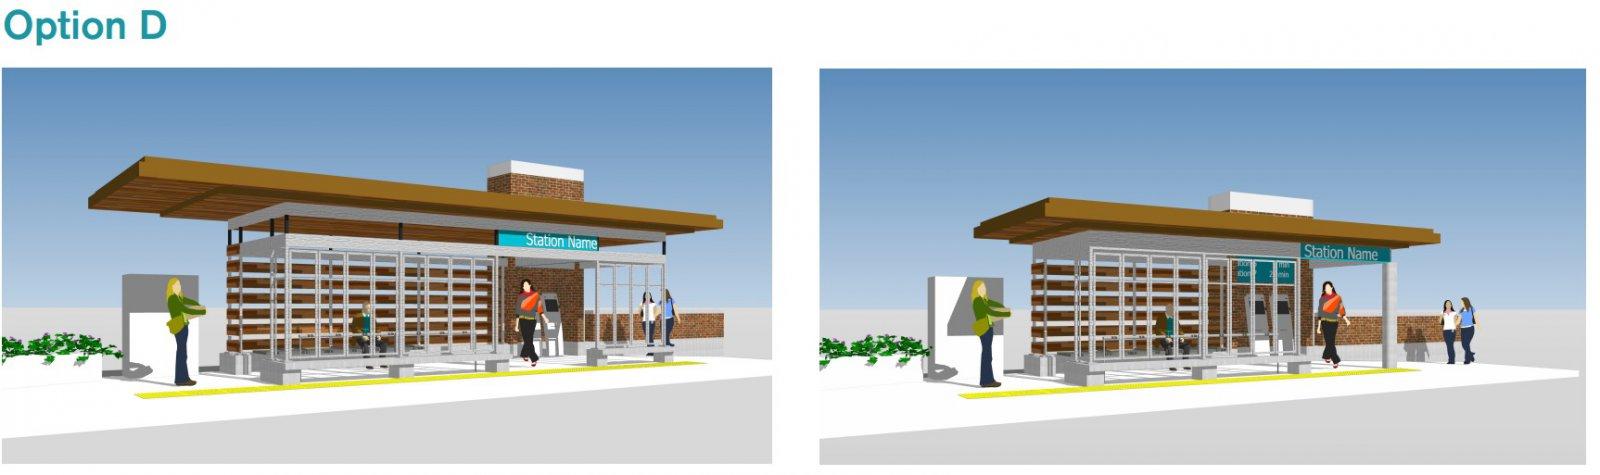 BRT Station Option D